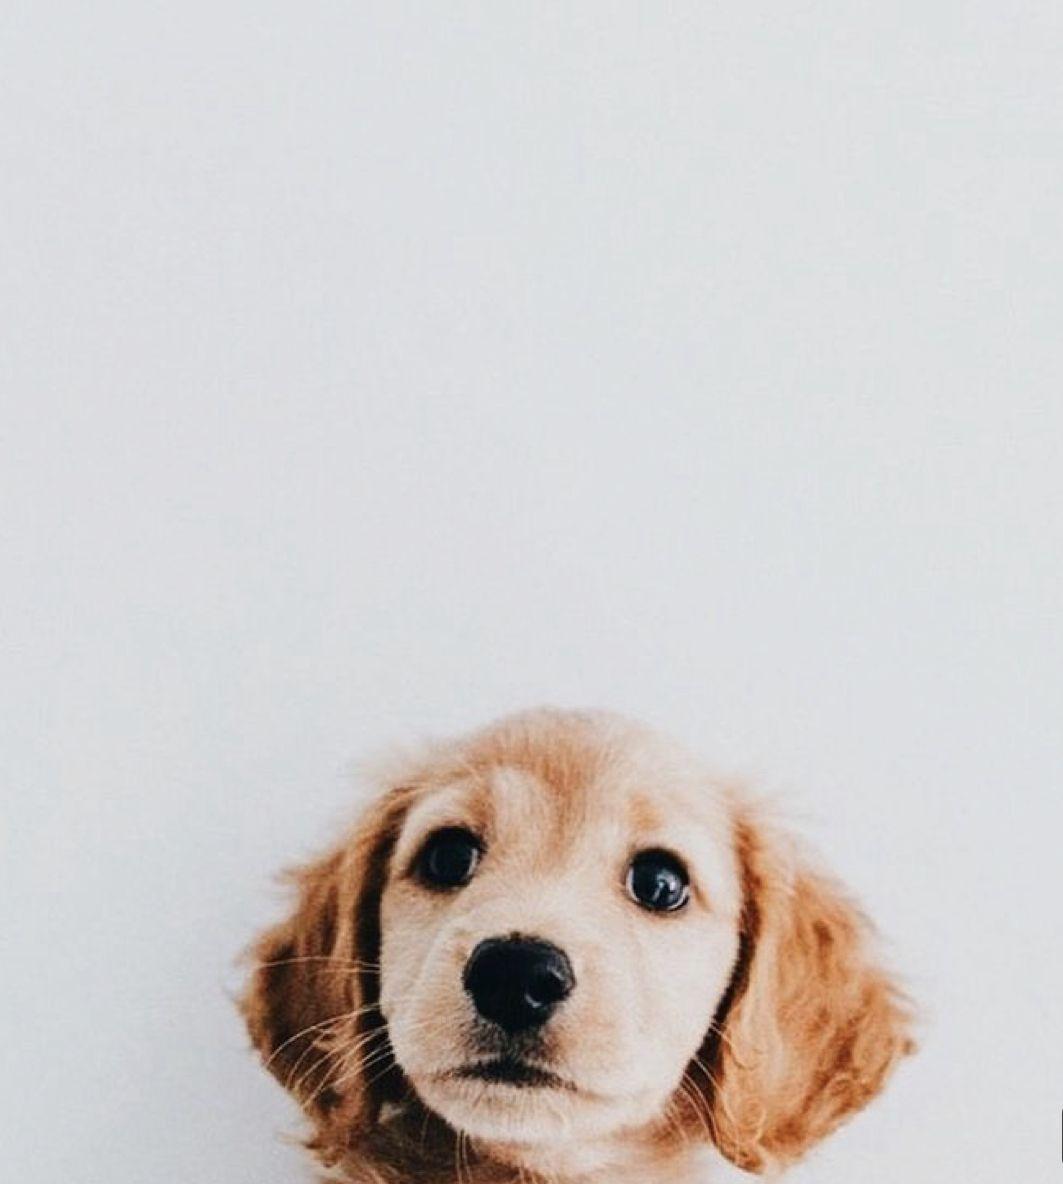 Cutedogs Puppy Puppies Puppywallpaper Cutepuppy Wallpaper Cute Cute Animals Puppies Cute Creatures